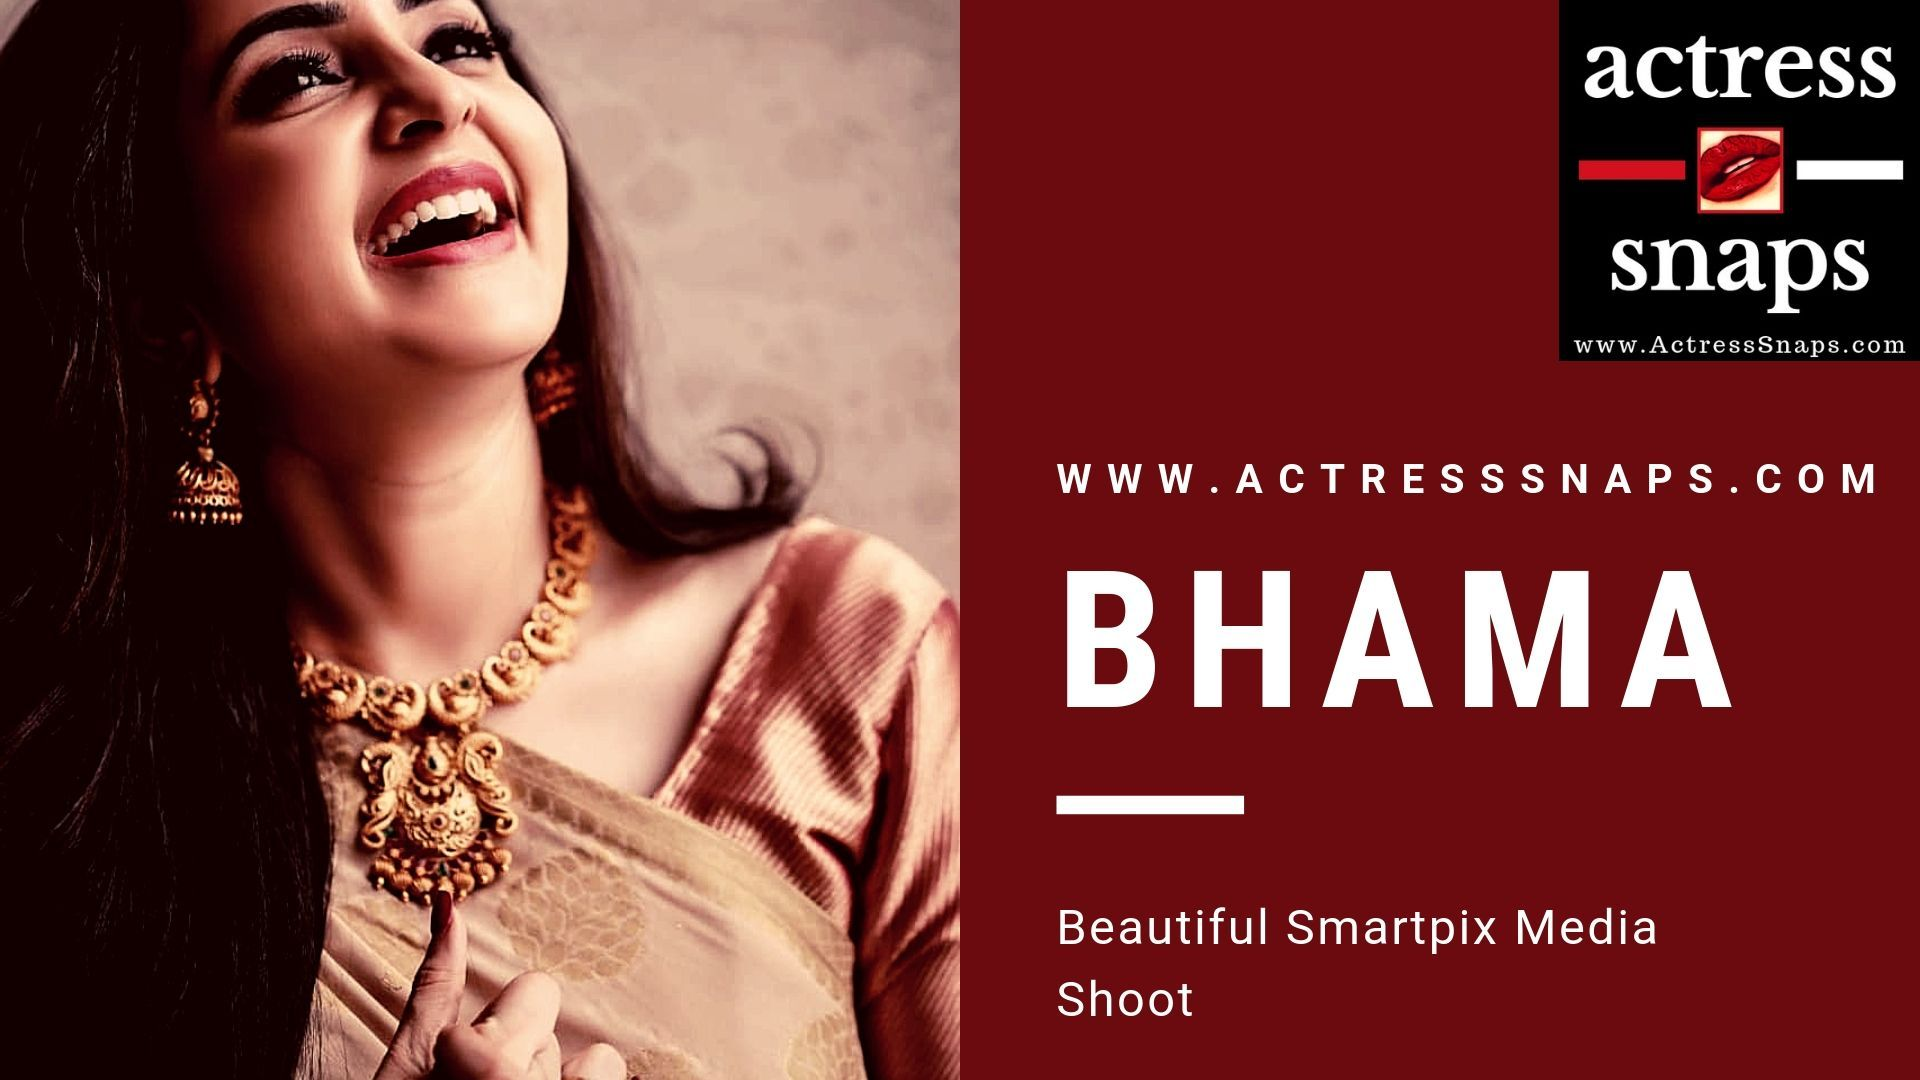 Actress Bhama loking Beautiful in Photo Shoot - Sexy Actress Pictures | Hot Actress Pictures - ActressSnaps.com